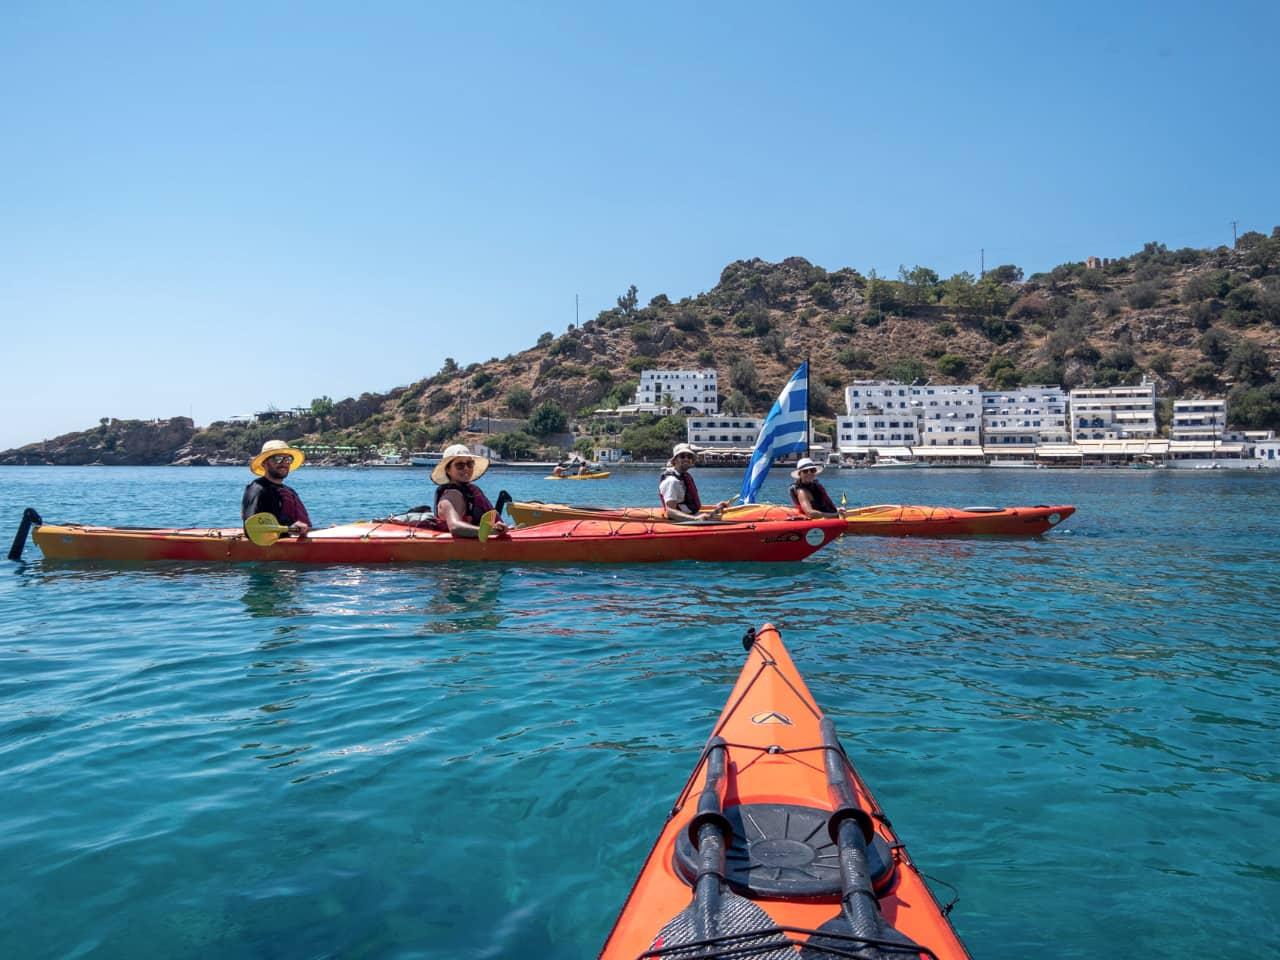 ten-day sea kayak trip, multi day expedition sea-kayak west crete, chania sea kayak trip, chania crete sea kayak best activity, chania sea kayak tour, activities chania crete, things to do crete, West Crete Sea kayaking Expedition, one of the best sea kayaks trips in Greece